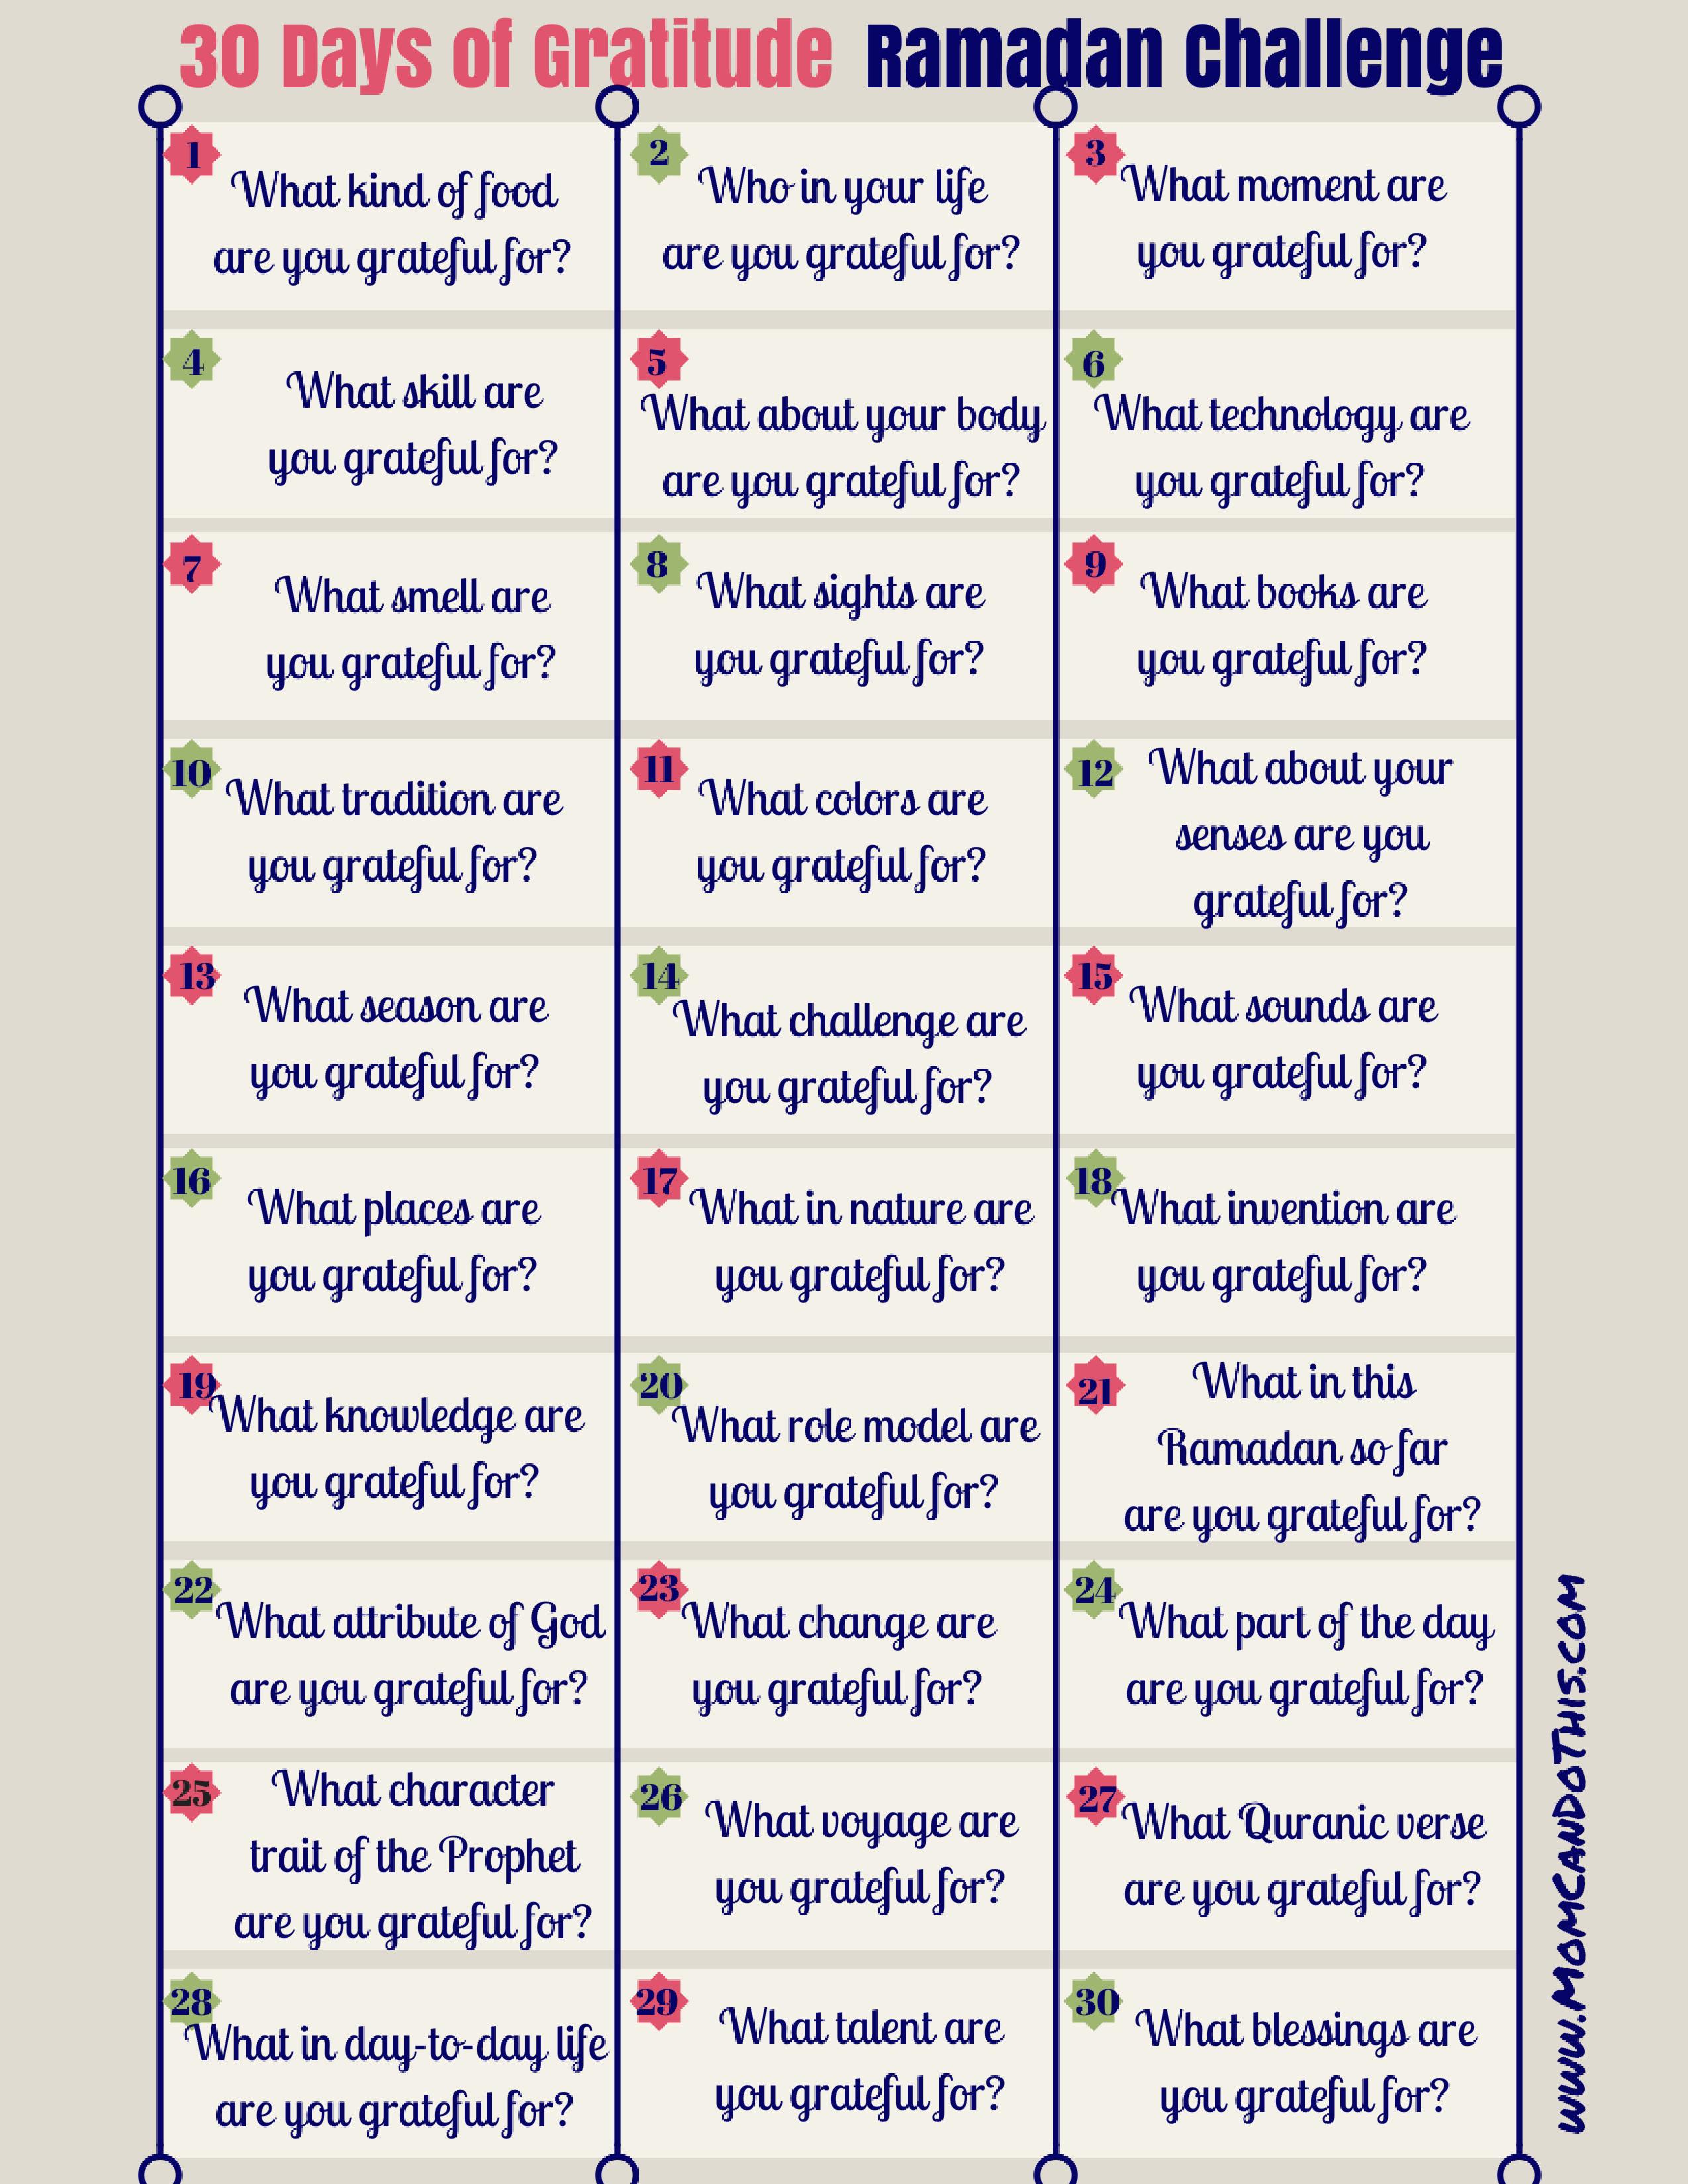 Ramadan Gratitude Challenge - 30 Day Challenge. Make Ramadan Count! - Free Printable Gratitude Worksheets